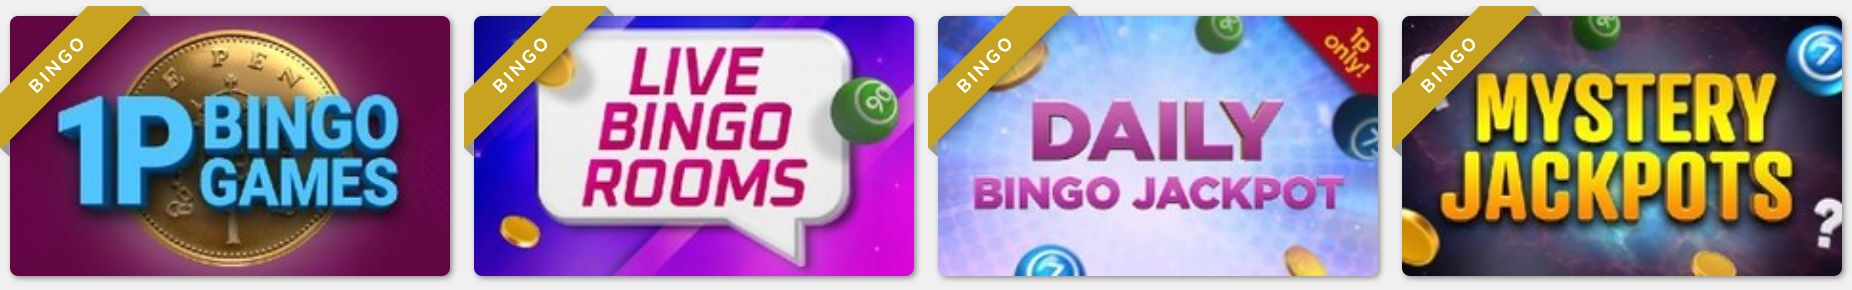 Bingo Extra Bingo Games